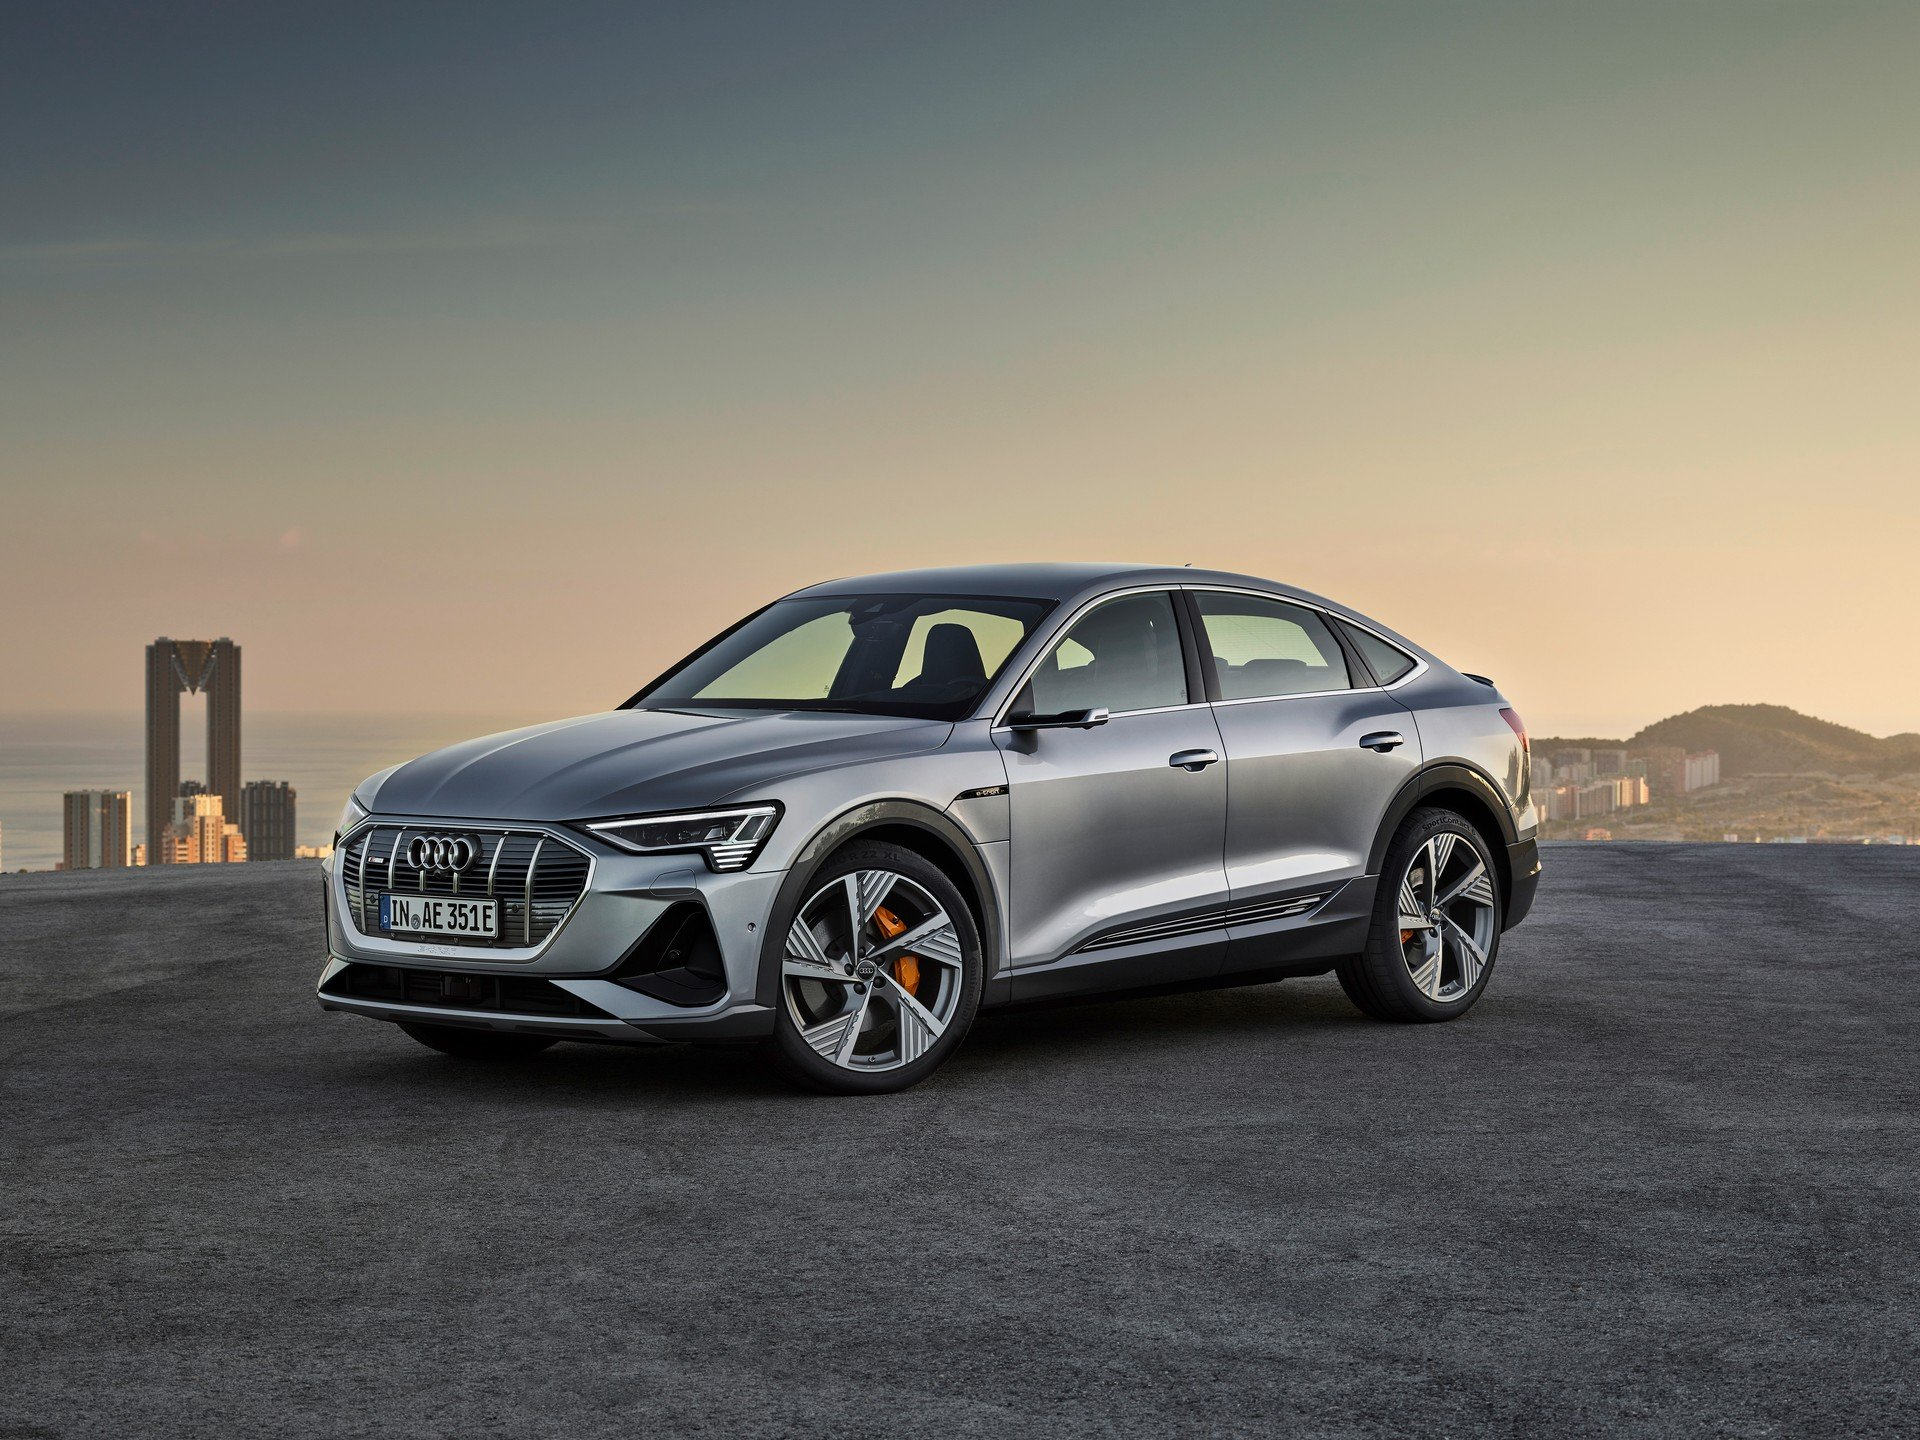 Электро-купе Audi e-tron Sportback представили официально